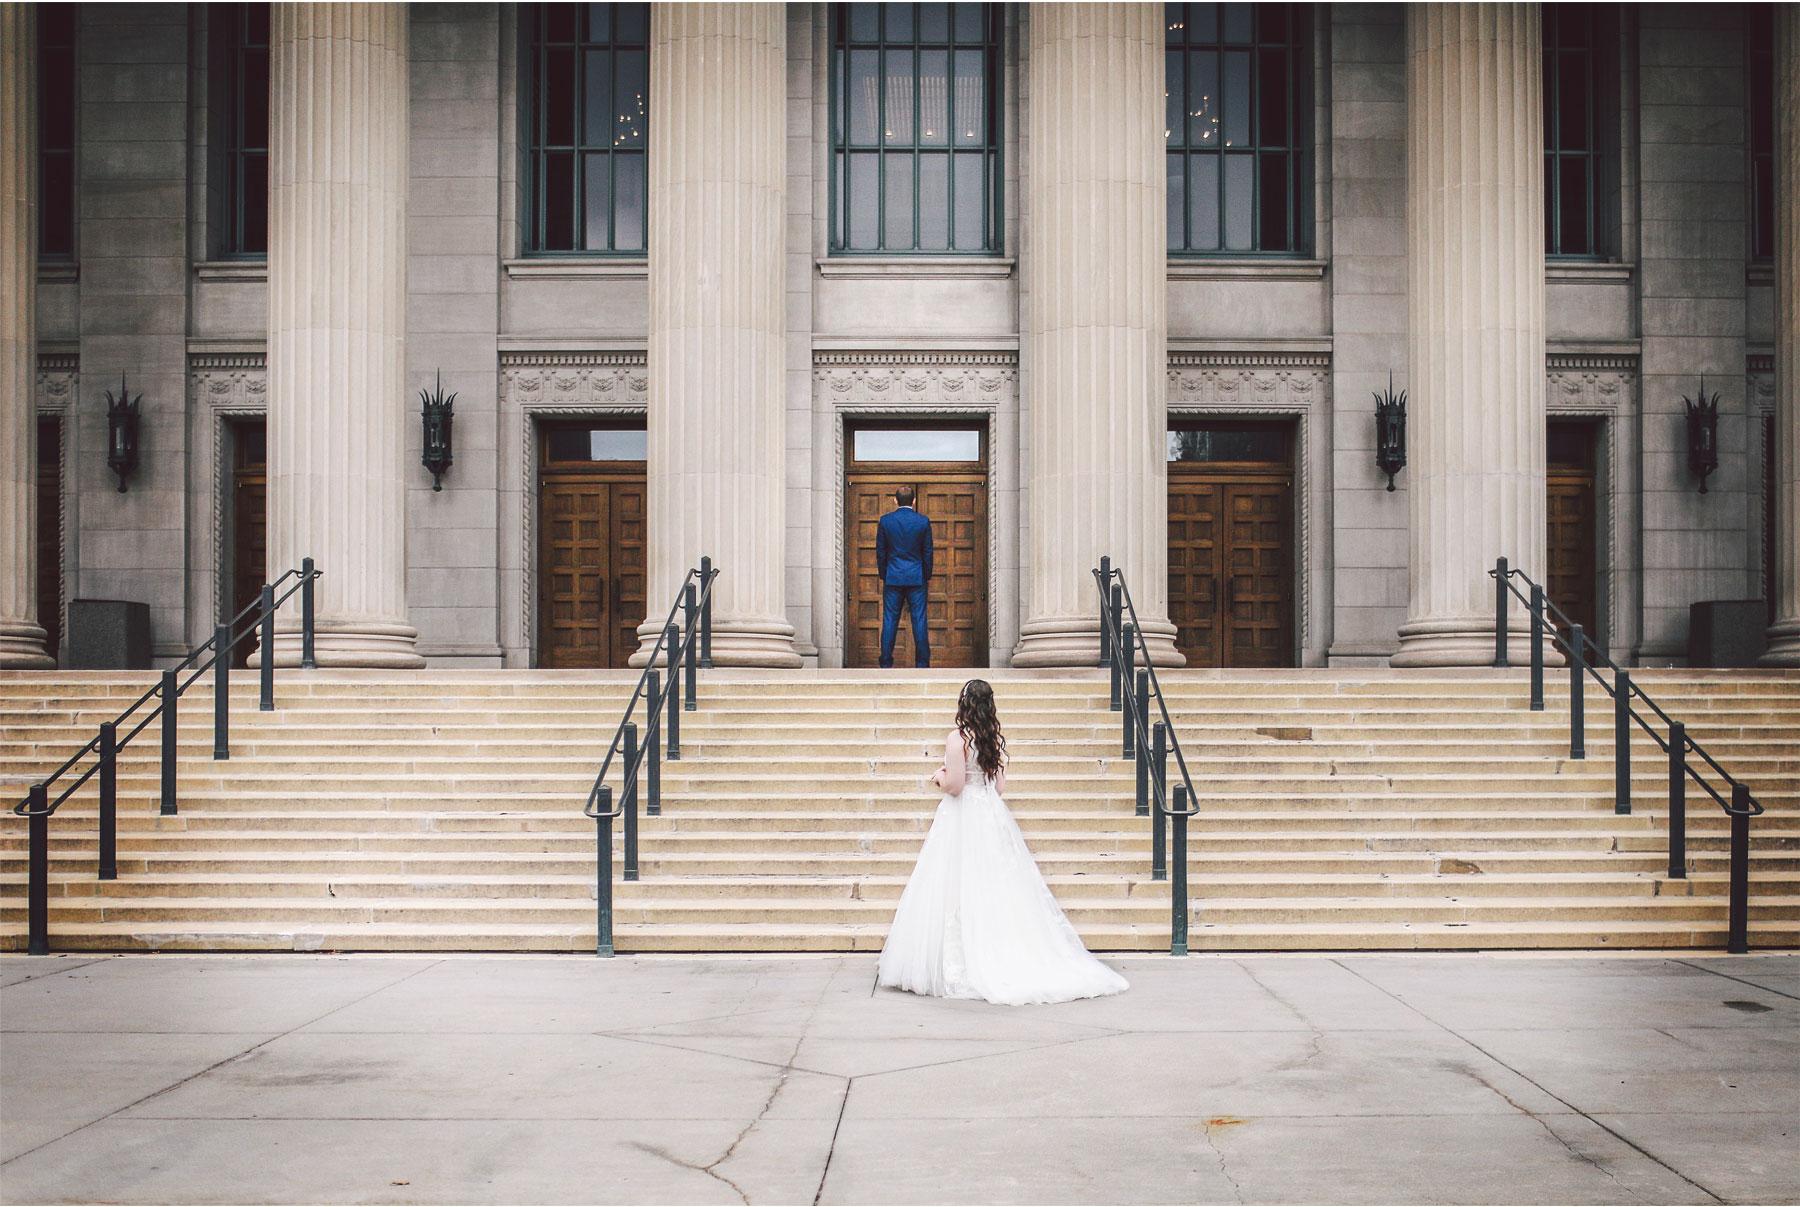 03-Saint-Paul-Minnesota-Wedding-Photography-by-Vick-Photography-Saint-Paul-Athletic-Club-First-Look-Kelsey-and-Jeffery.jpg